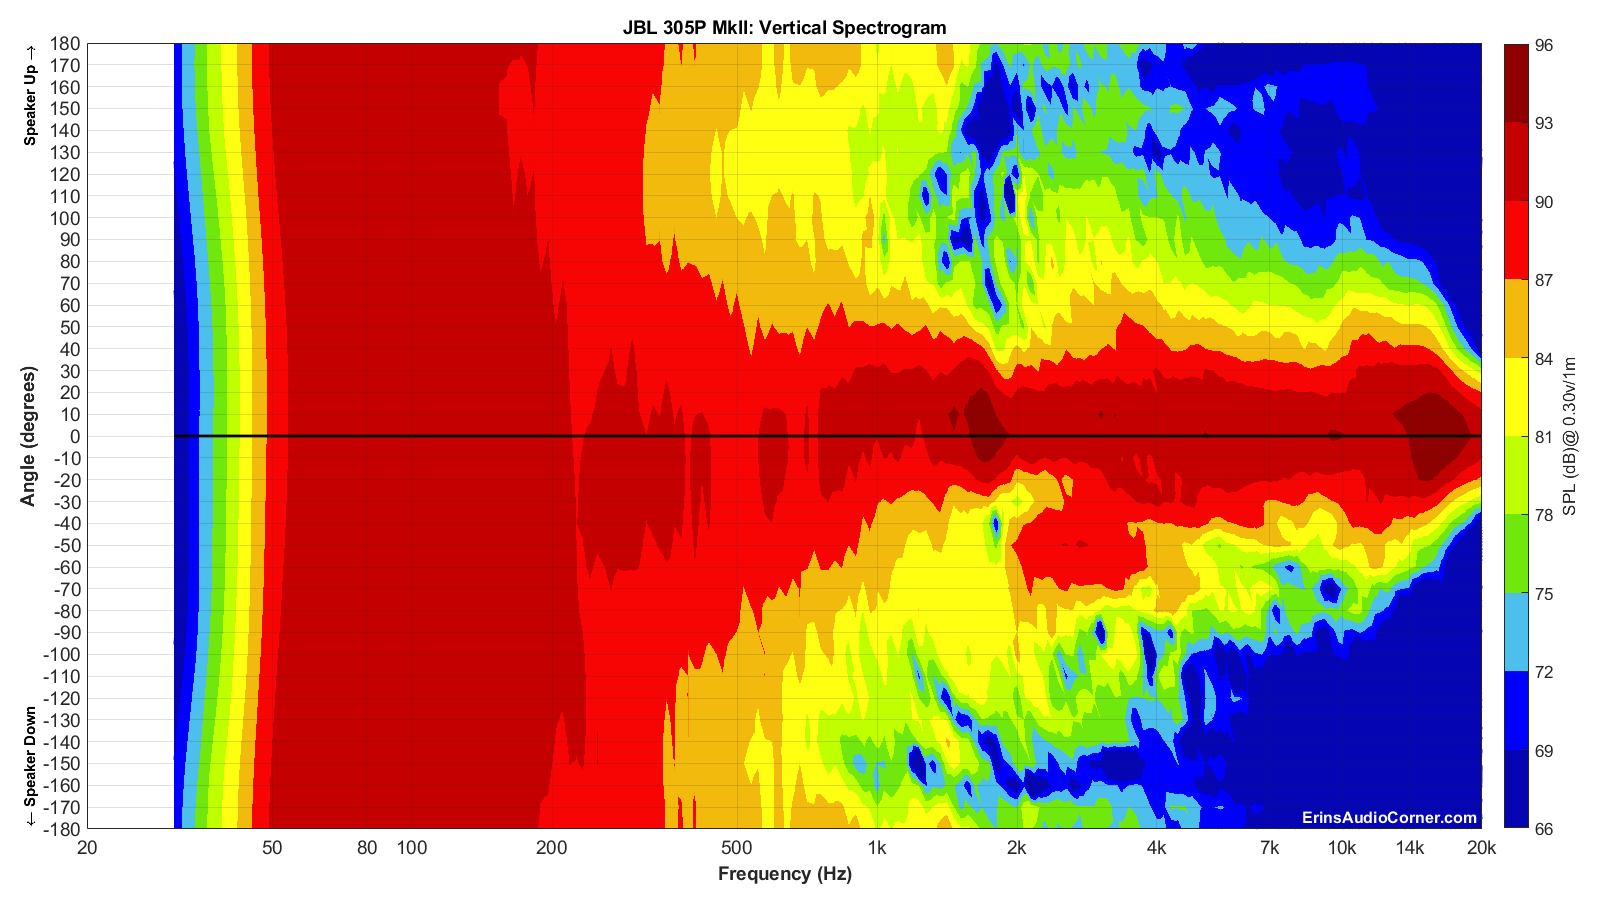 JBL%20305P%20MkII_Vertical_Spectrogram_Full.png